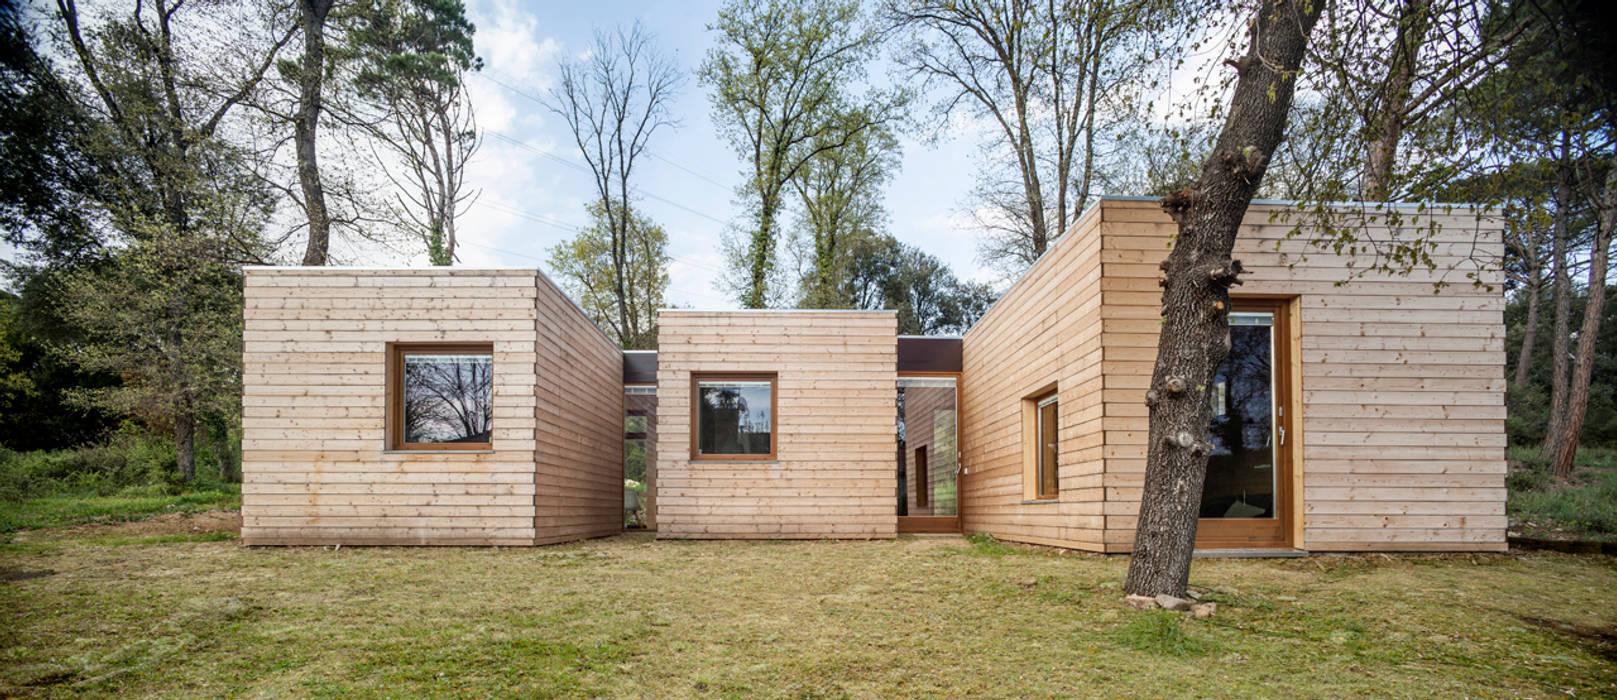 Casa GG by Alventosa Morell Arquitectes Сучасний